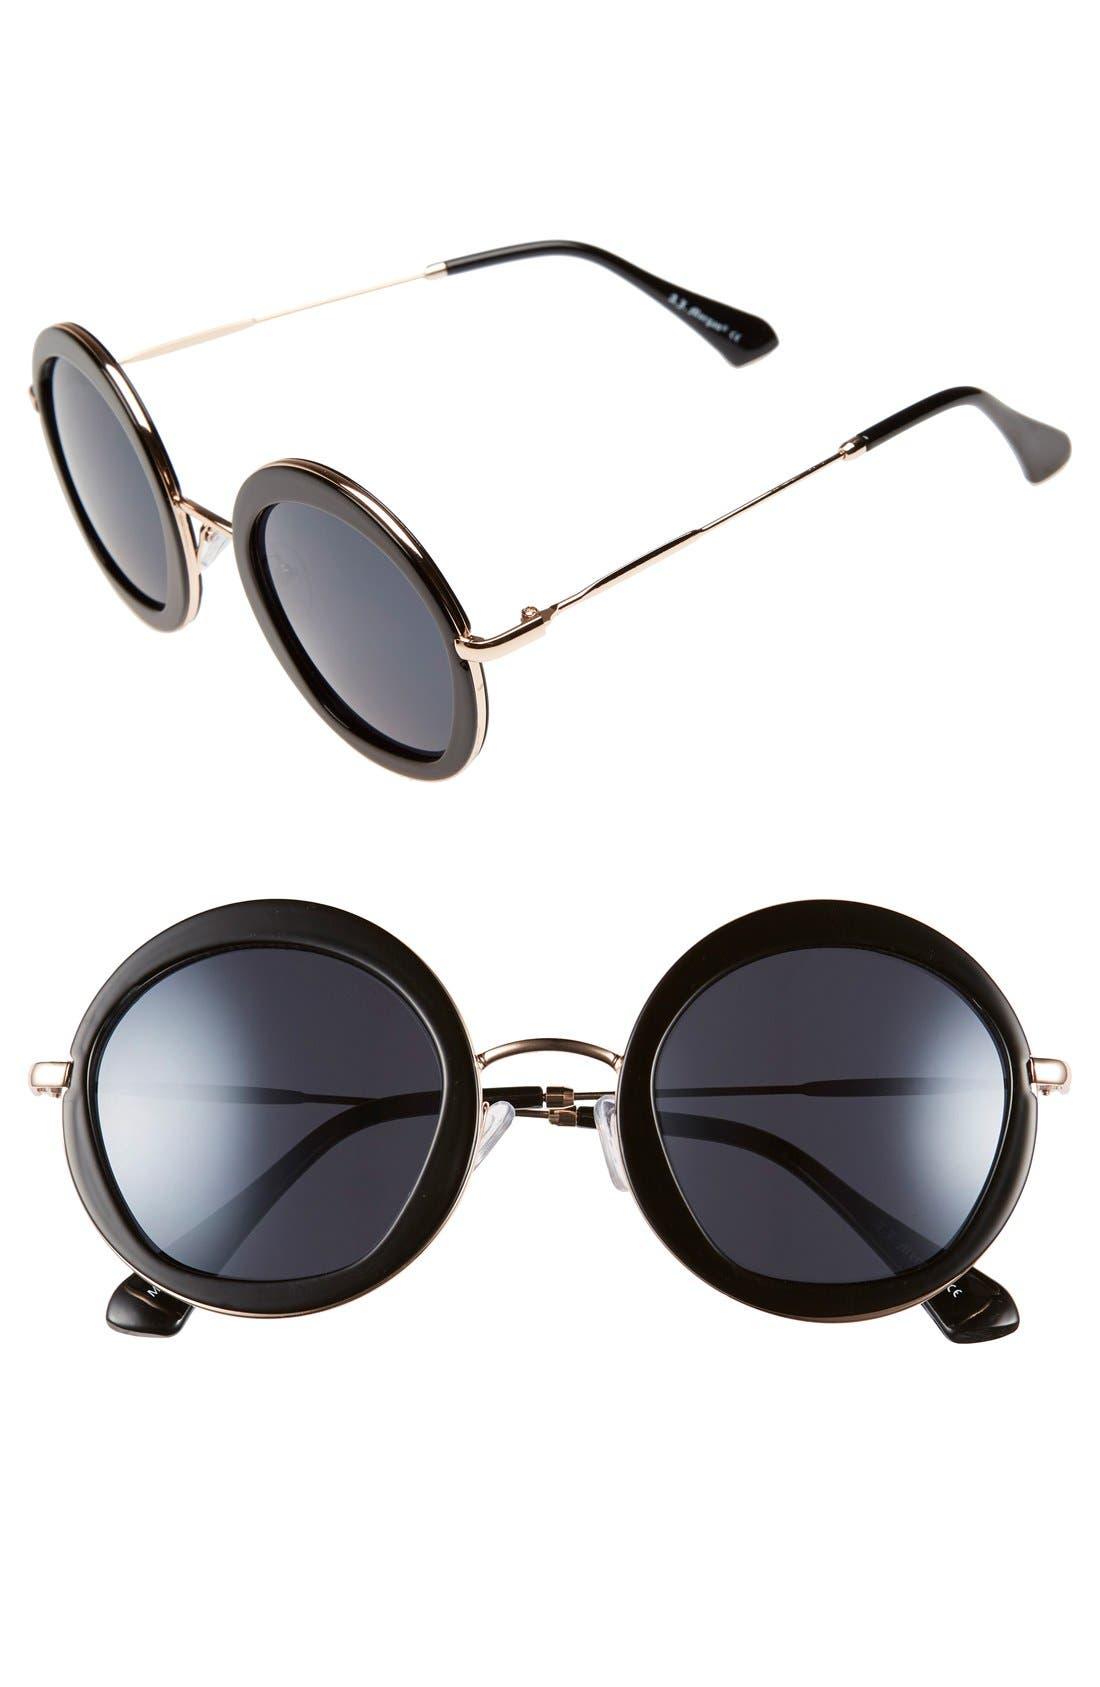 A.J. MORGAN 'Clique' 50mm Round Sunglasses, Main, color, 001